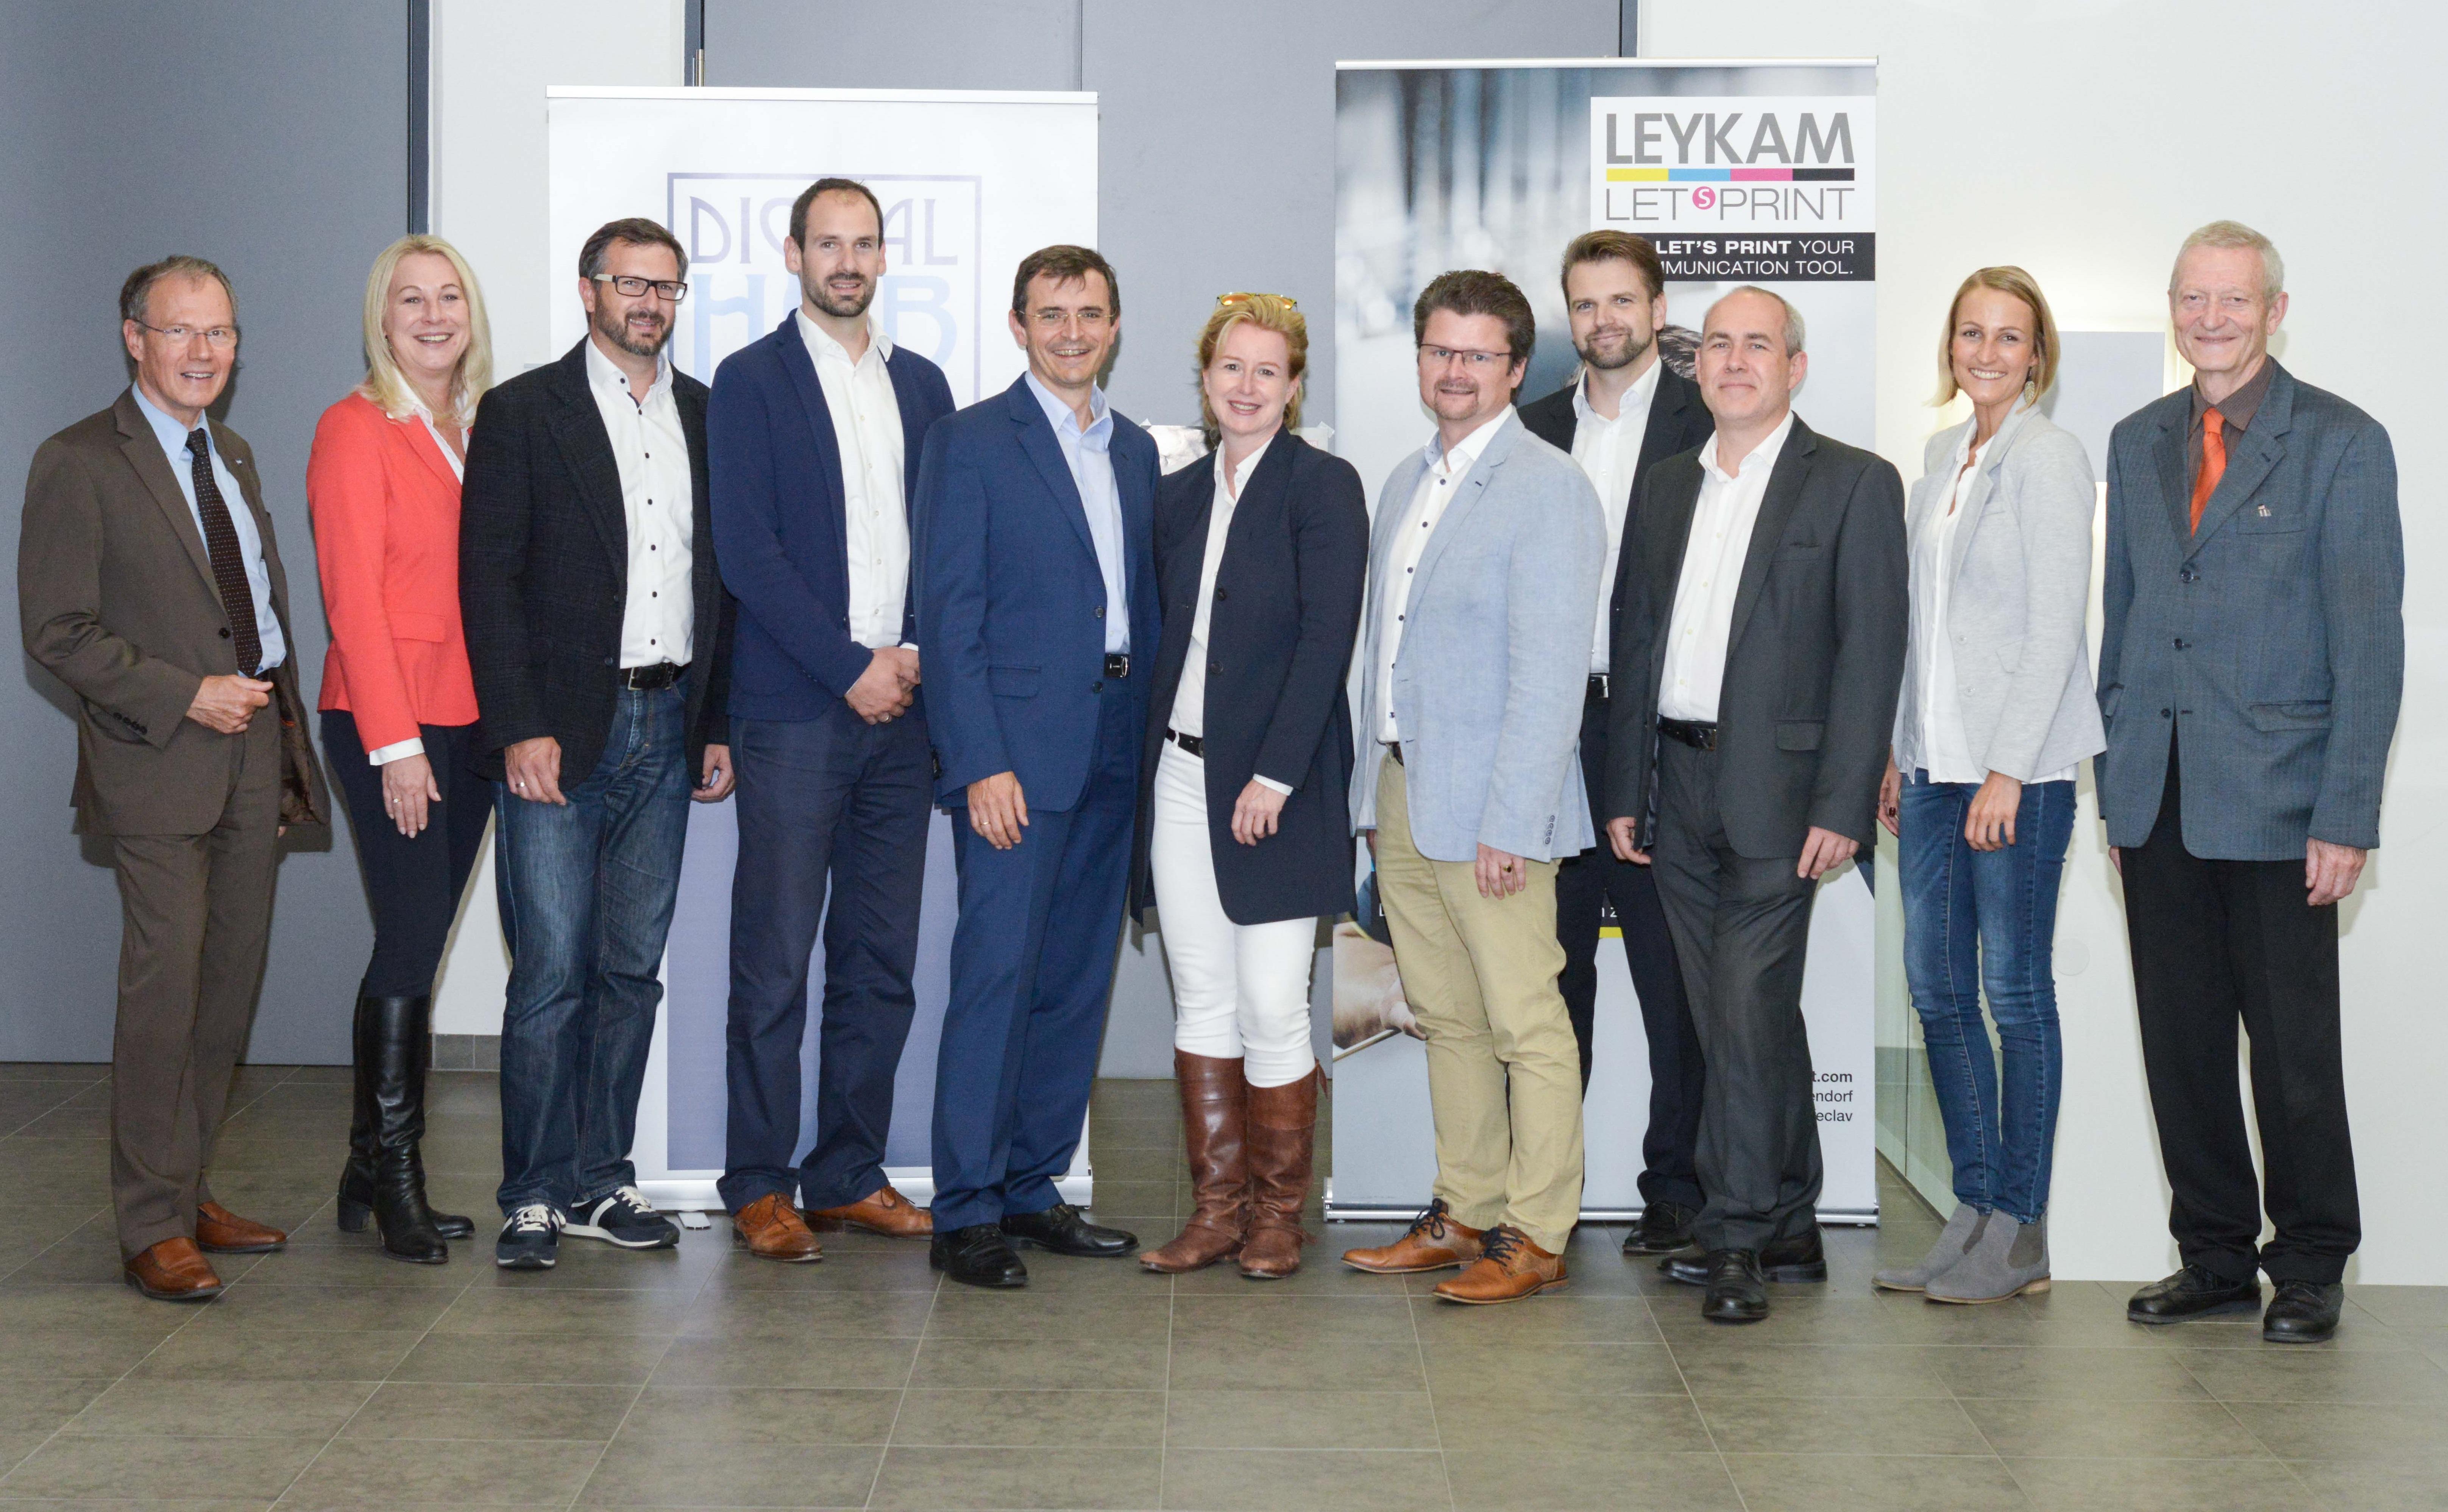 Gruppenfoto - LEYKAM / Digital Hub Vienna Event No 2, Softwarepark Hagenberg, 14.9.2017. Copyright: Digital Hub Vienna/Tsitsos